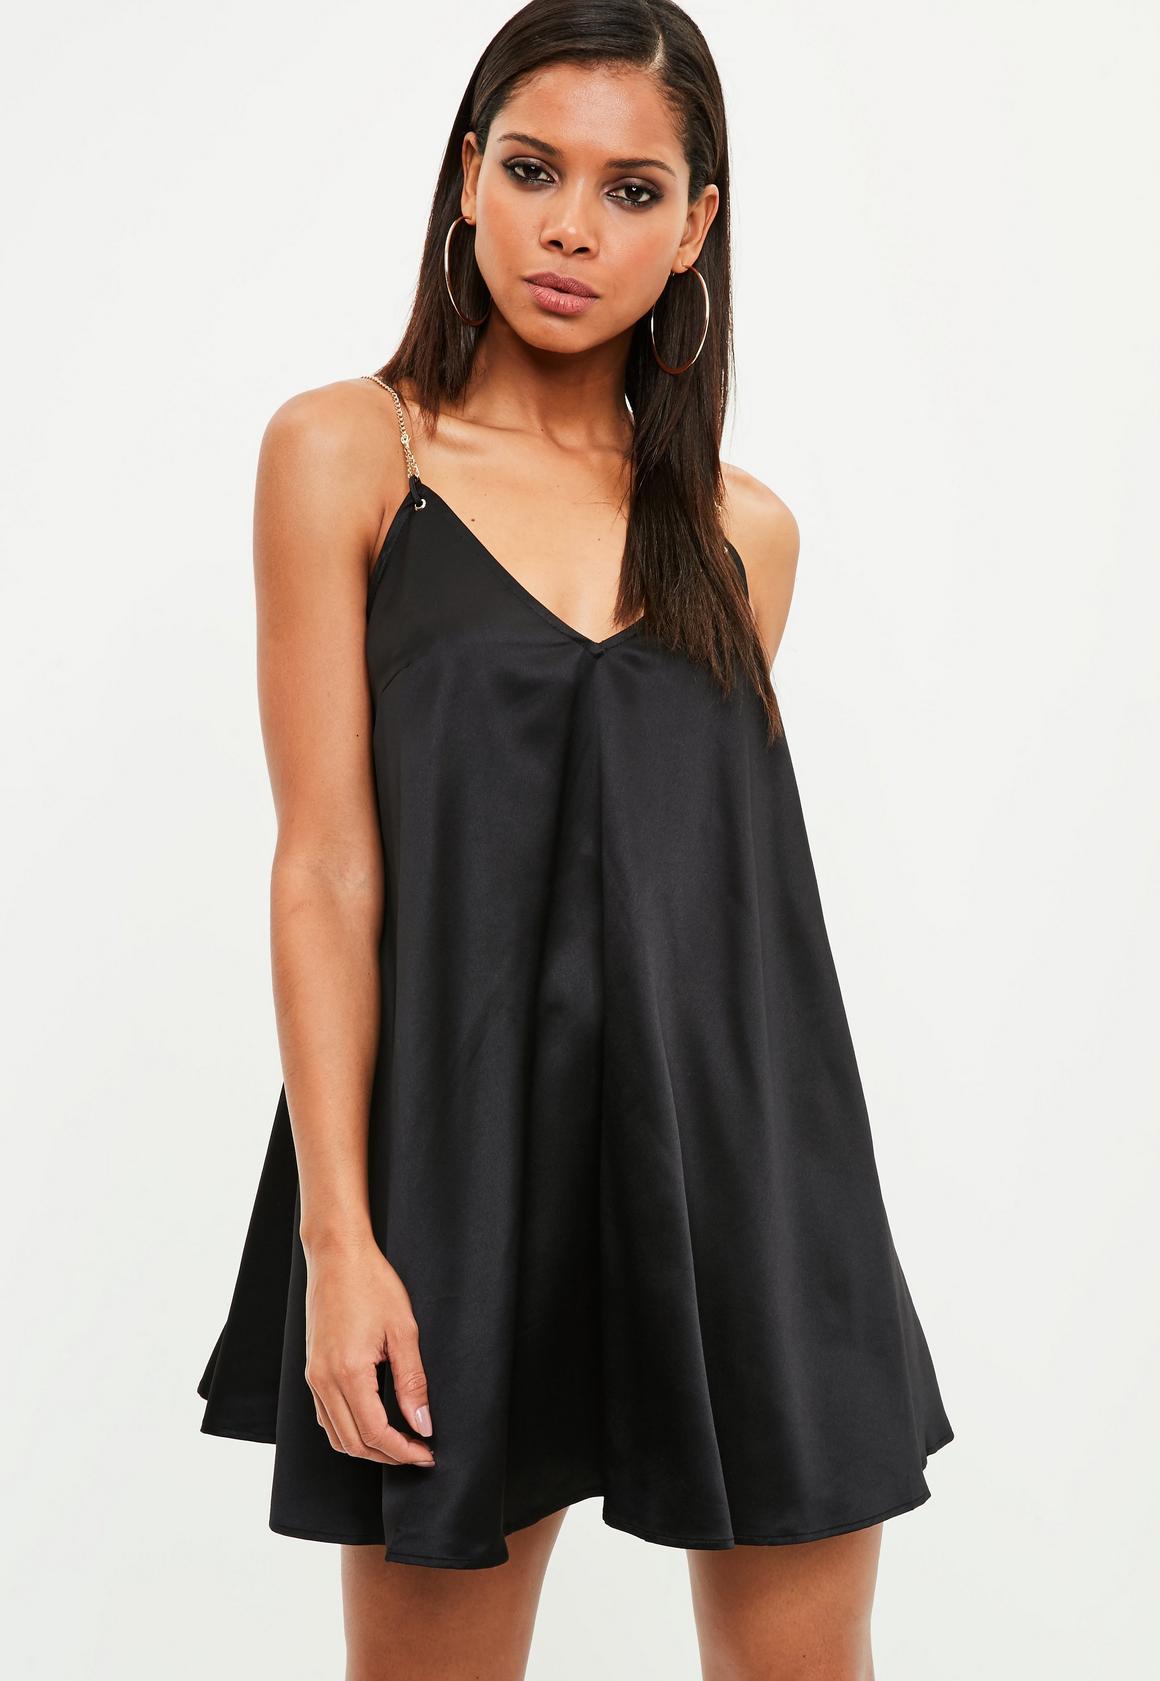 Black strap dresses